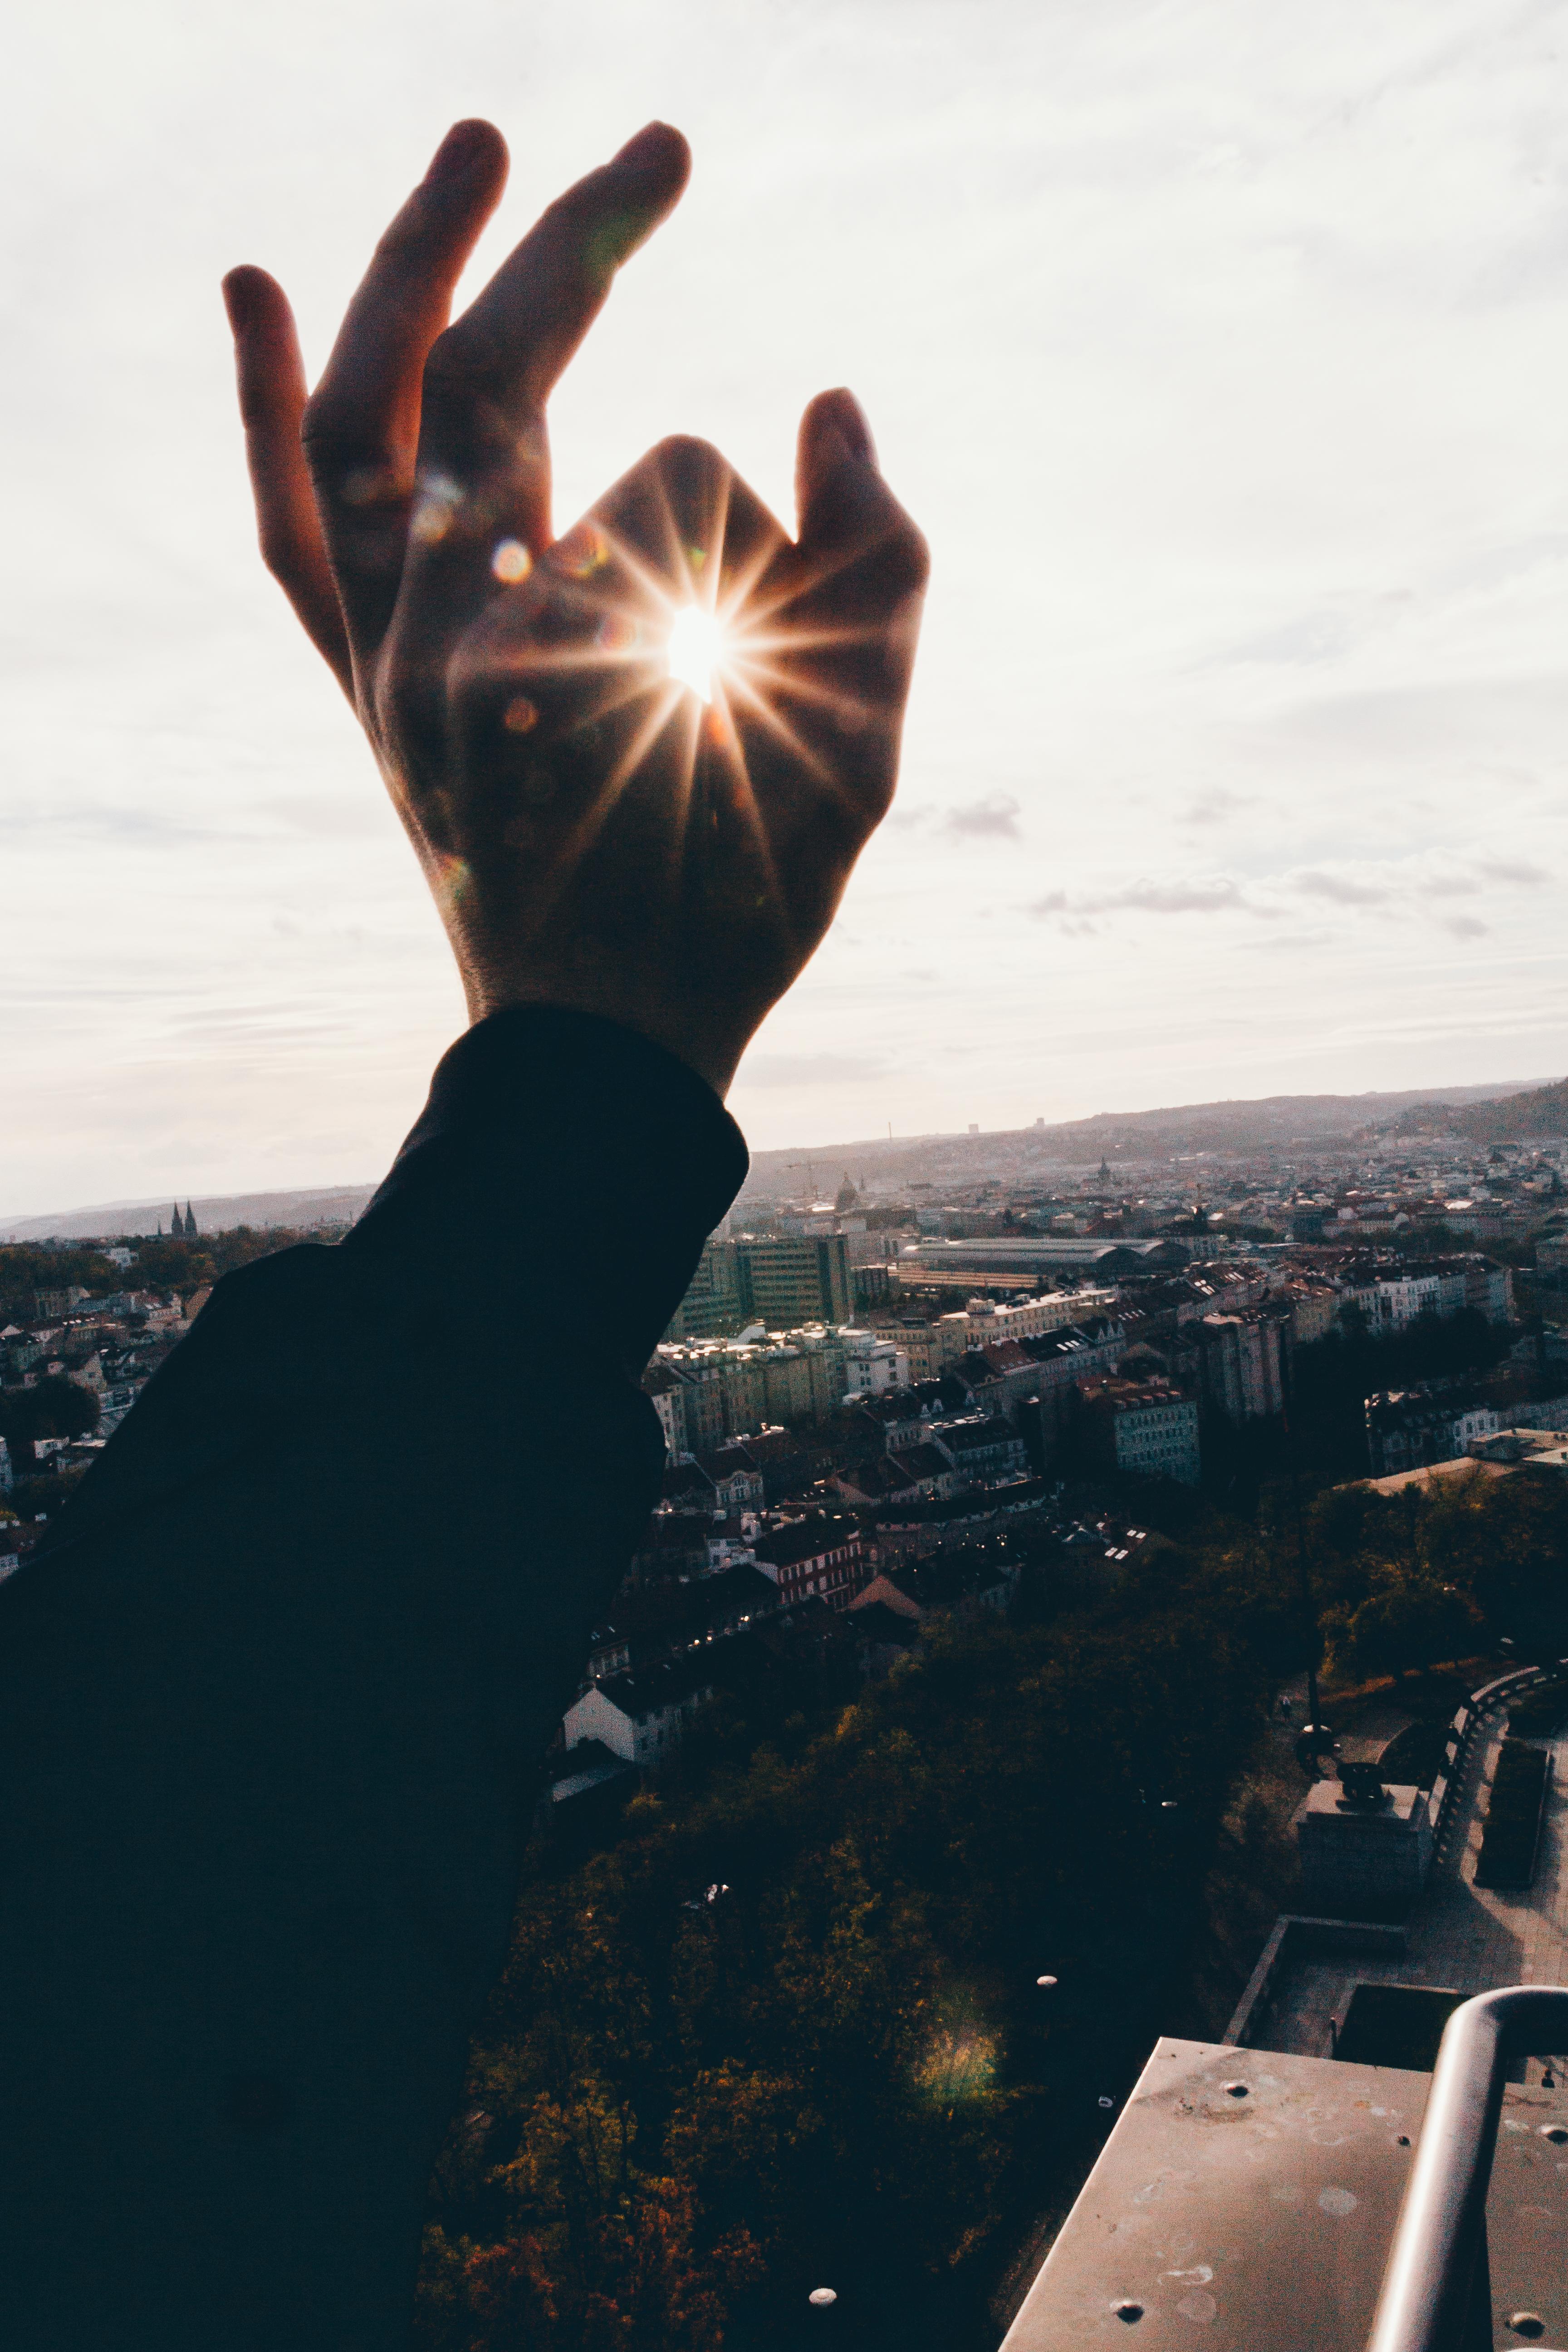 красивые картинки рук на фоне неба еще одно